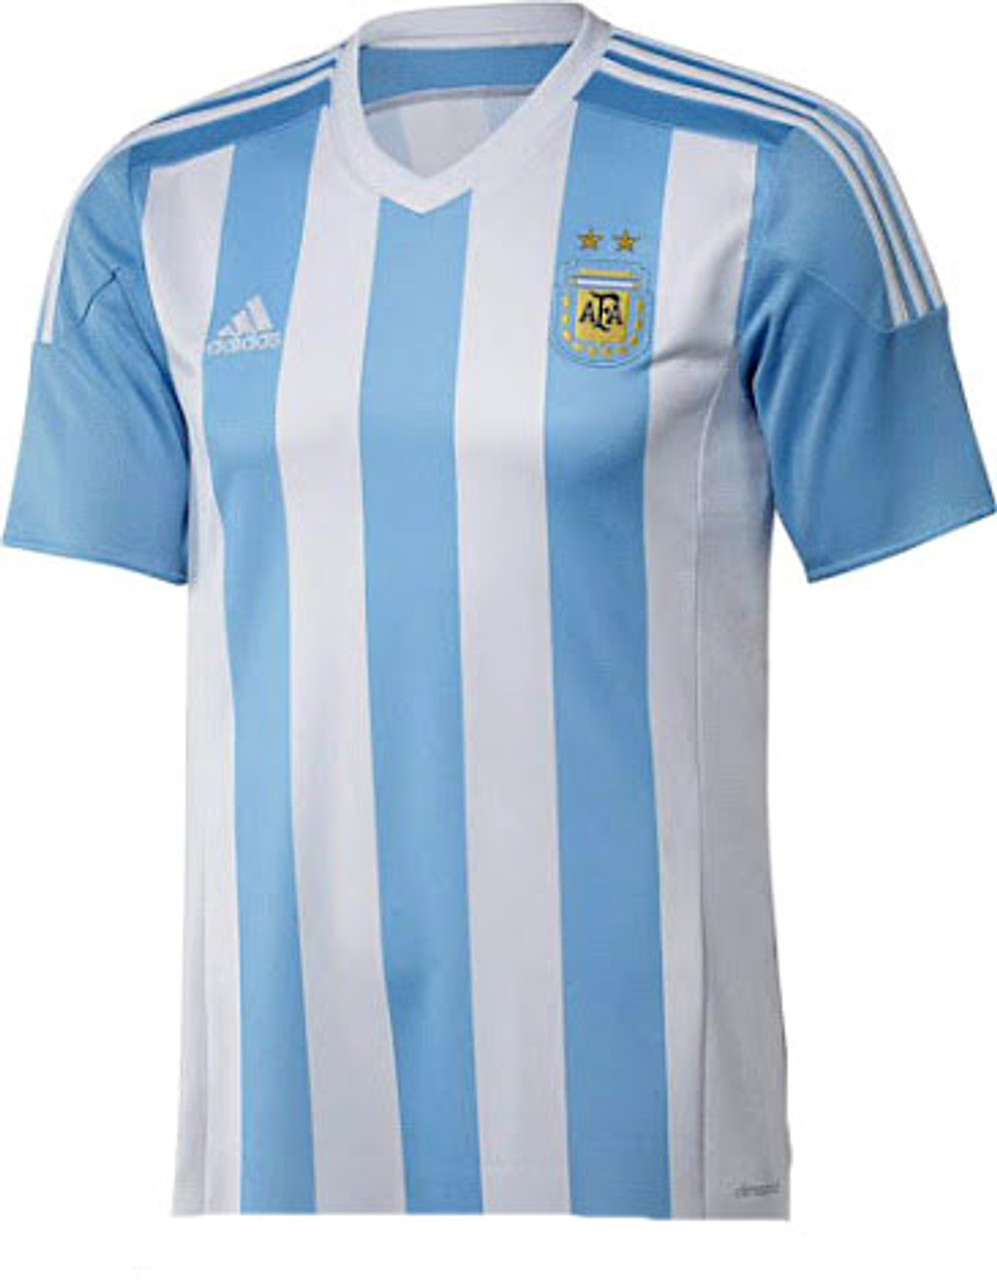 ADIDAS ARGENTINA 2015 HOME JERSEY